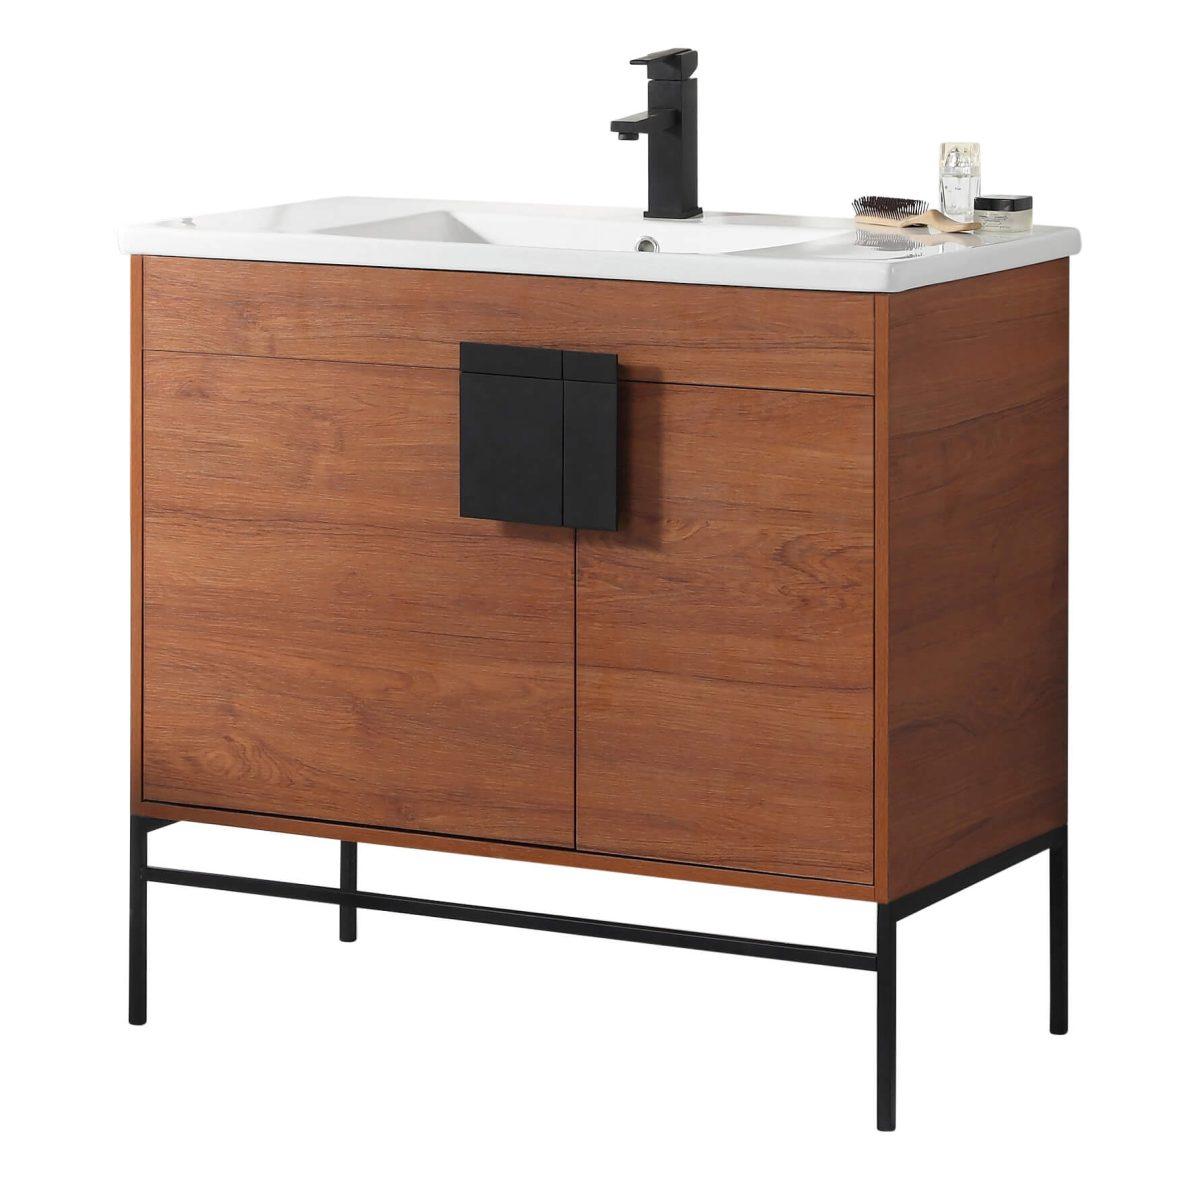 "Shawbridge 36"" Modern Bathroom Vanity  Spicy Walnut with Black Hardware"